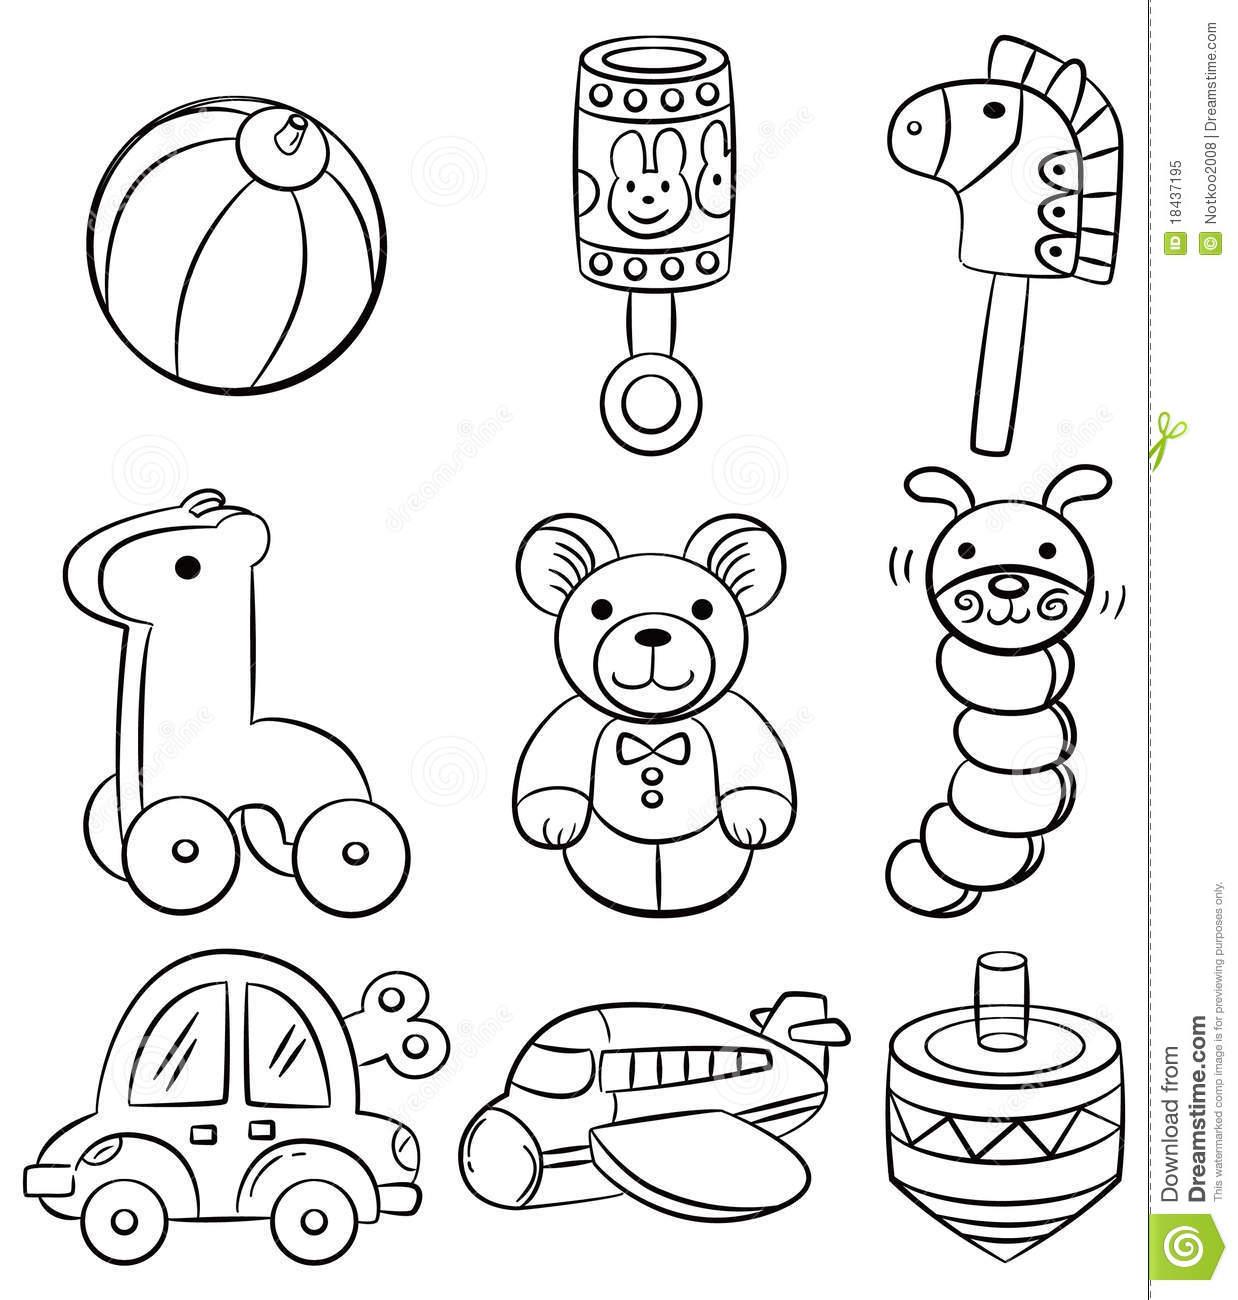 1238x1300 Cartoon Baby Drawing Hand Draw Cartoon Baby Toy Icon Royalty Free